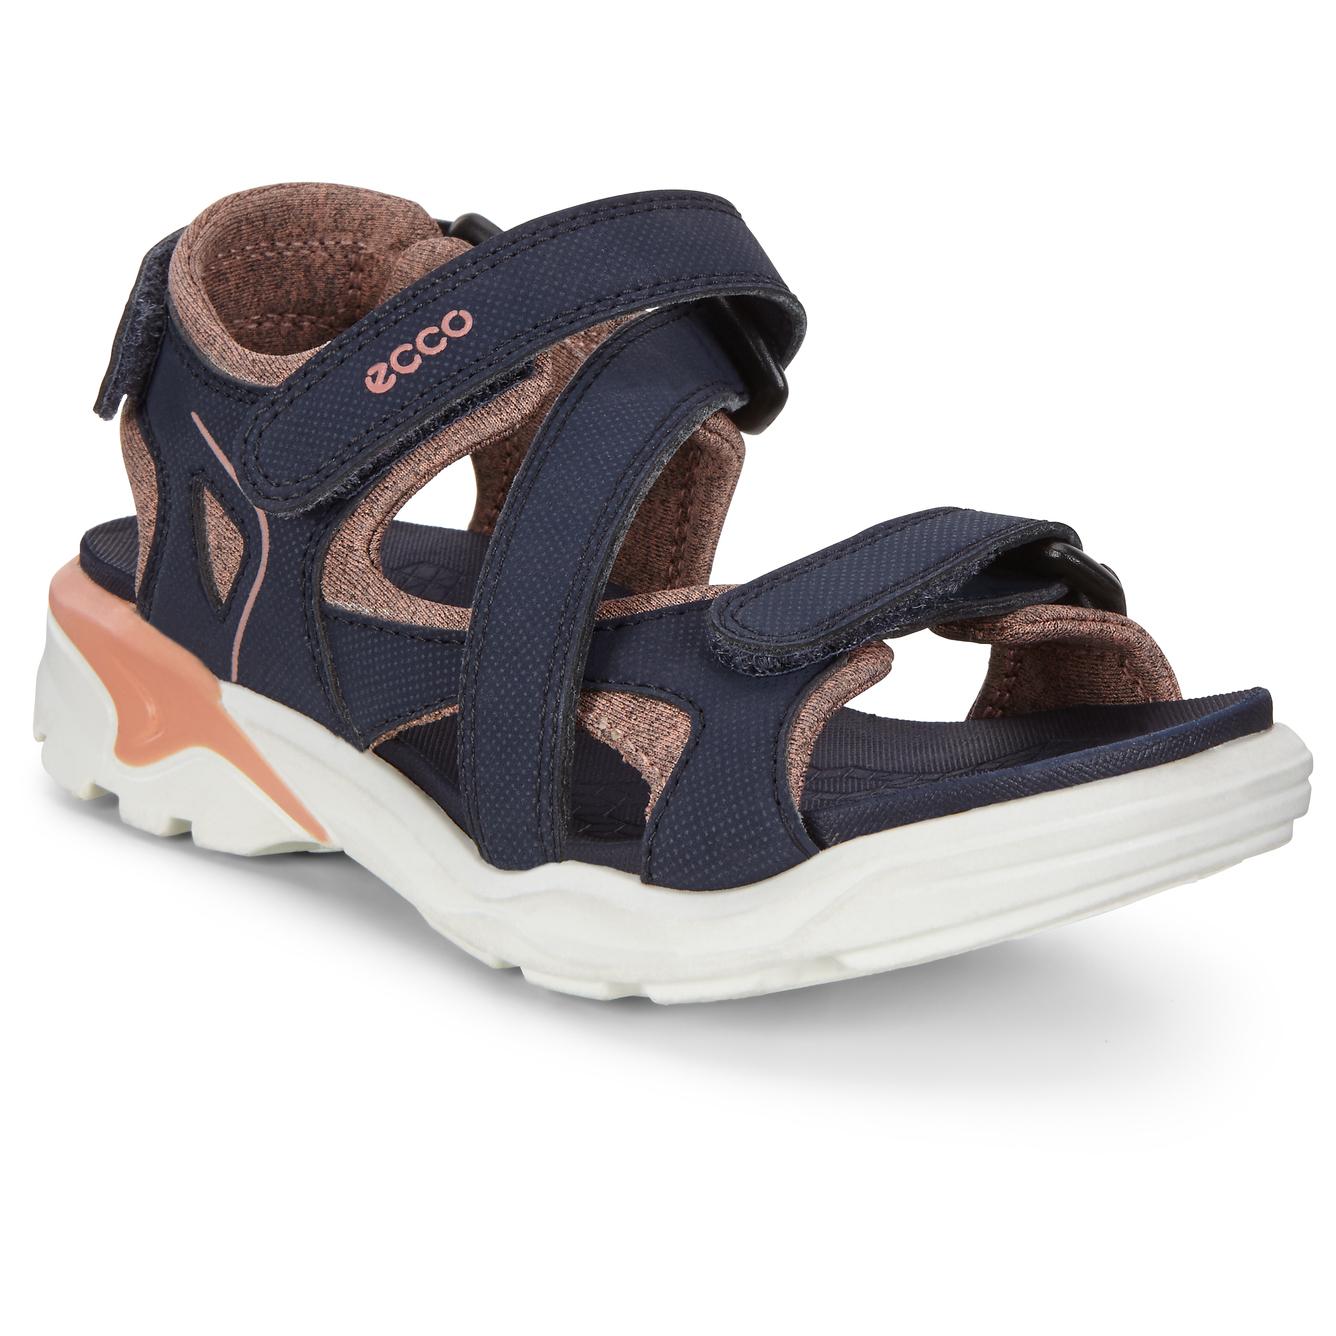 ecco sandals infant